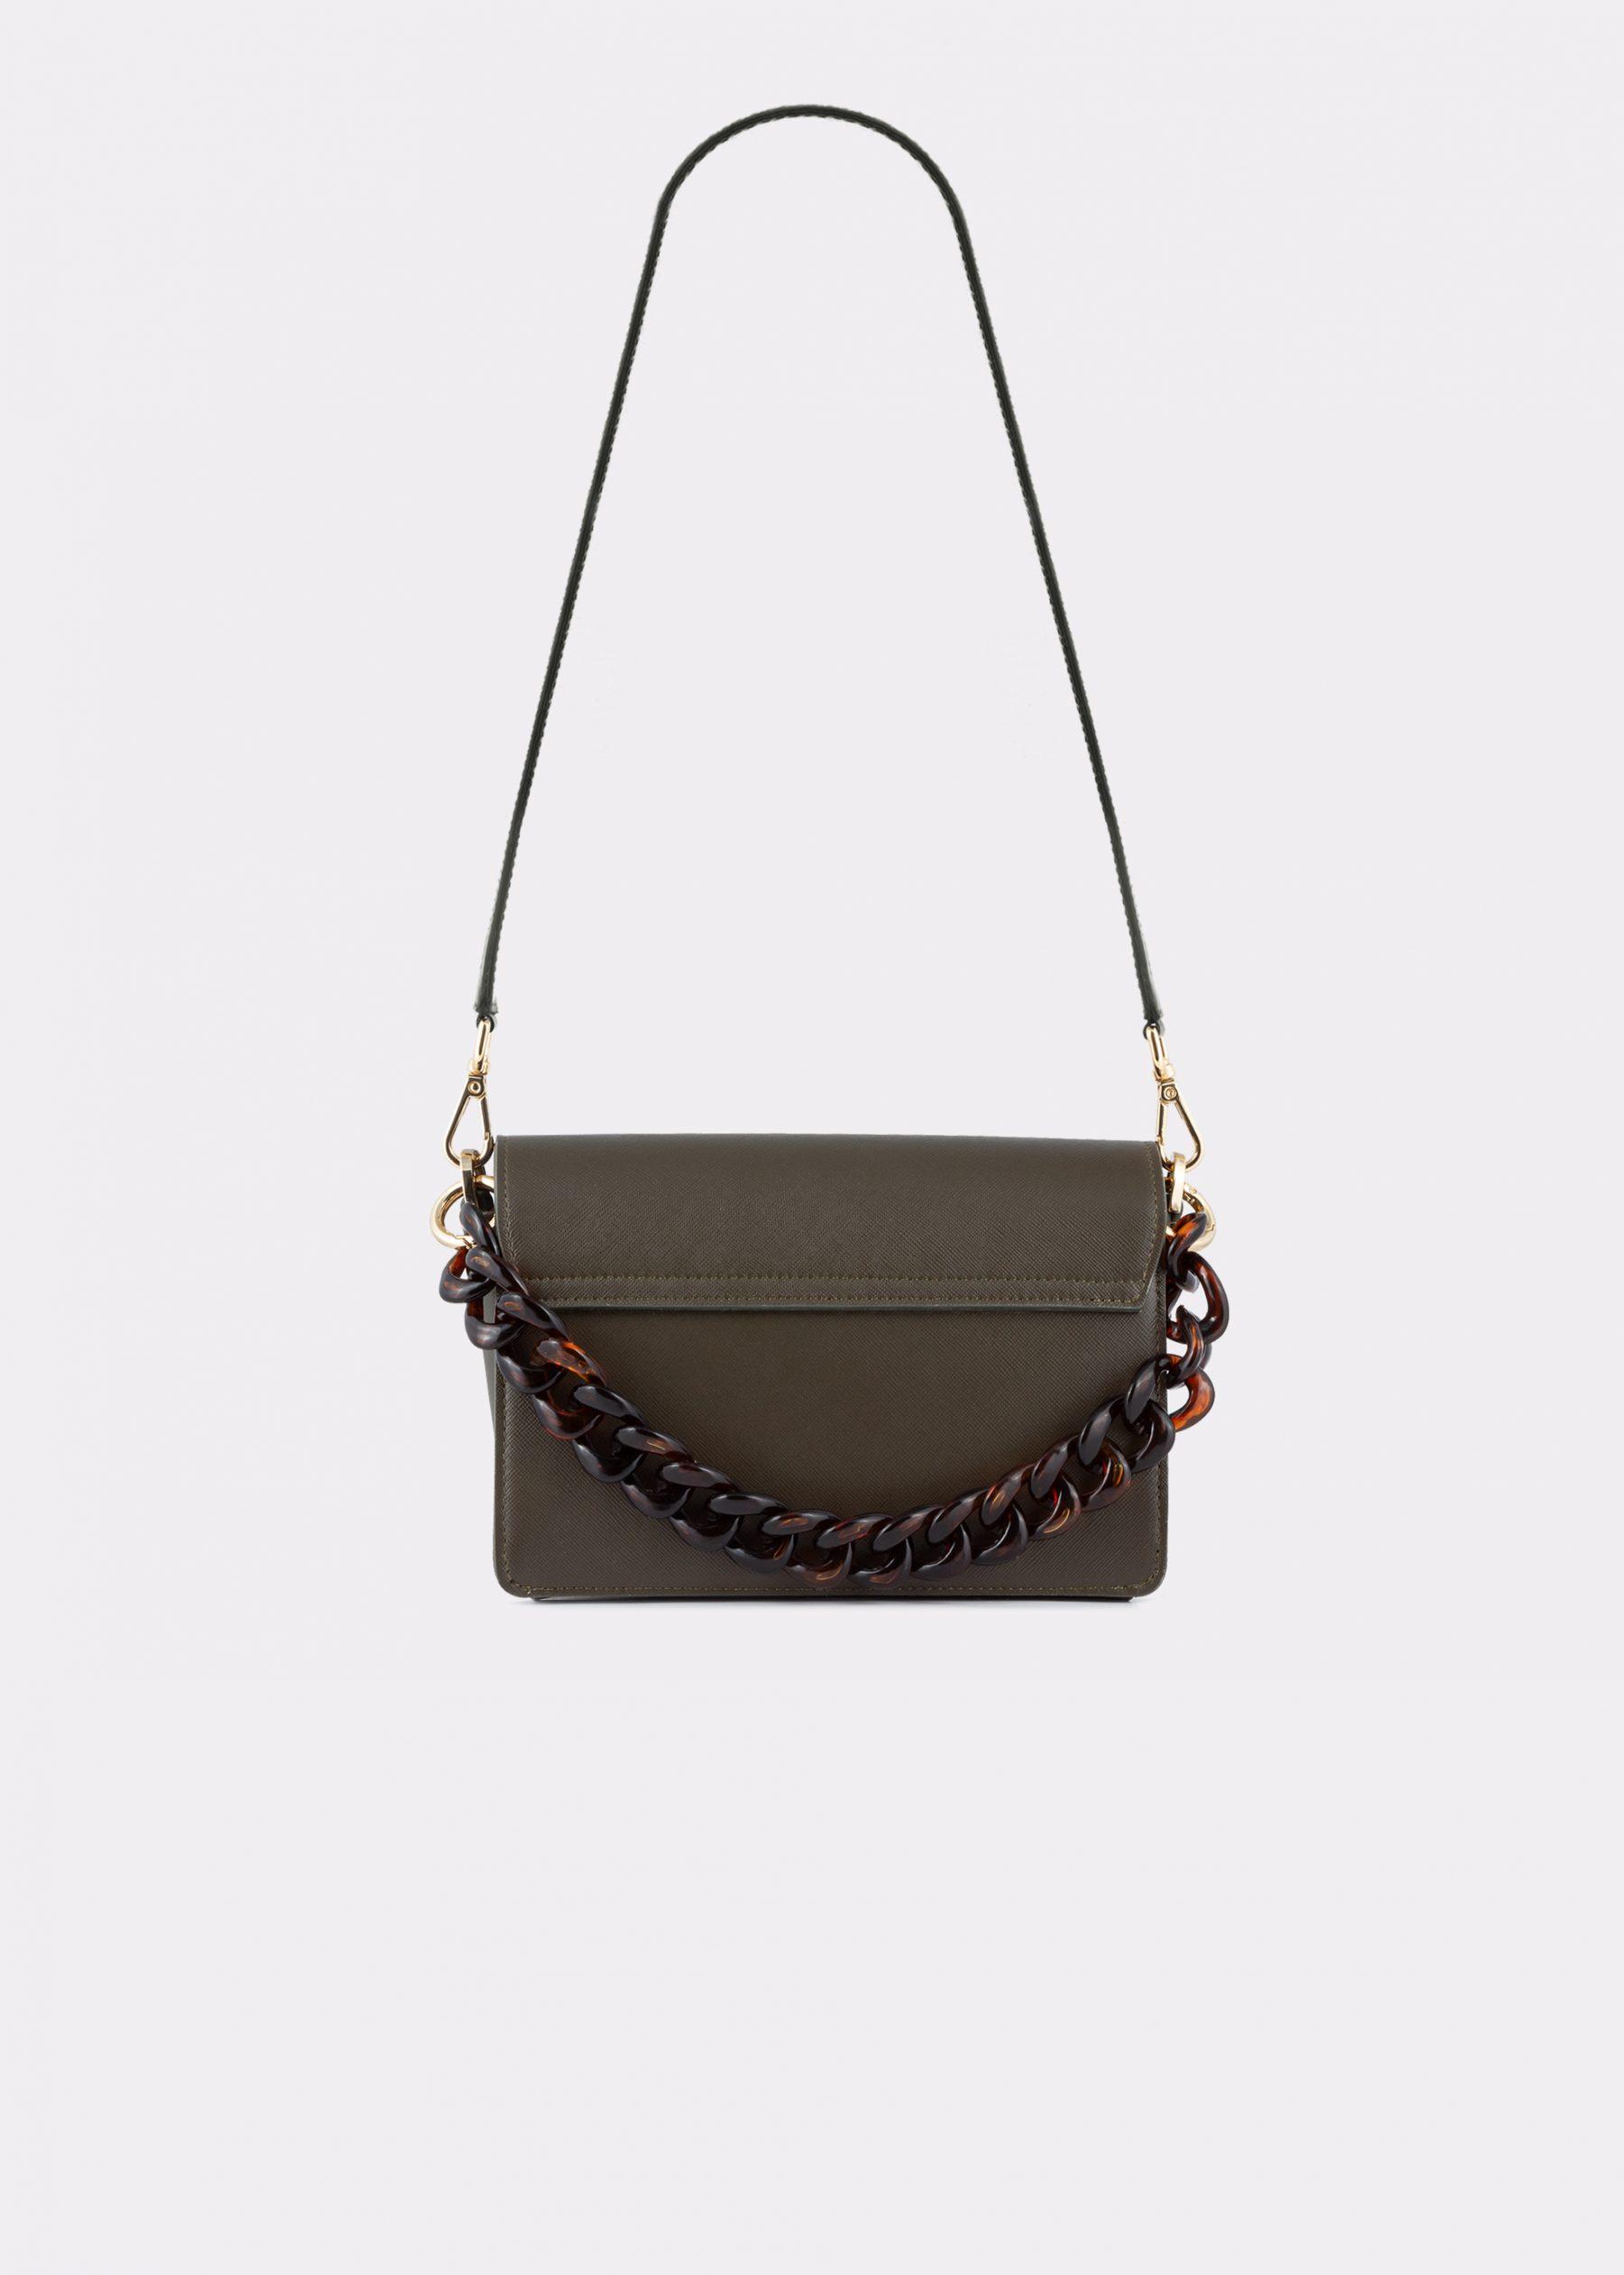 NIDO-Cuore_Mini-bag-Olivegreen_back view